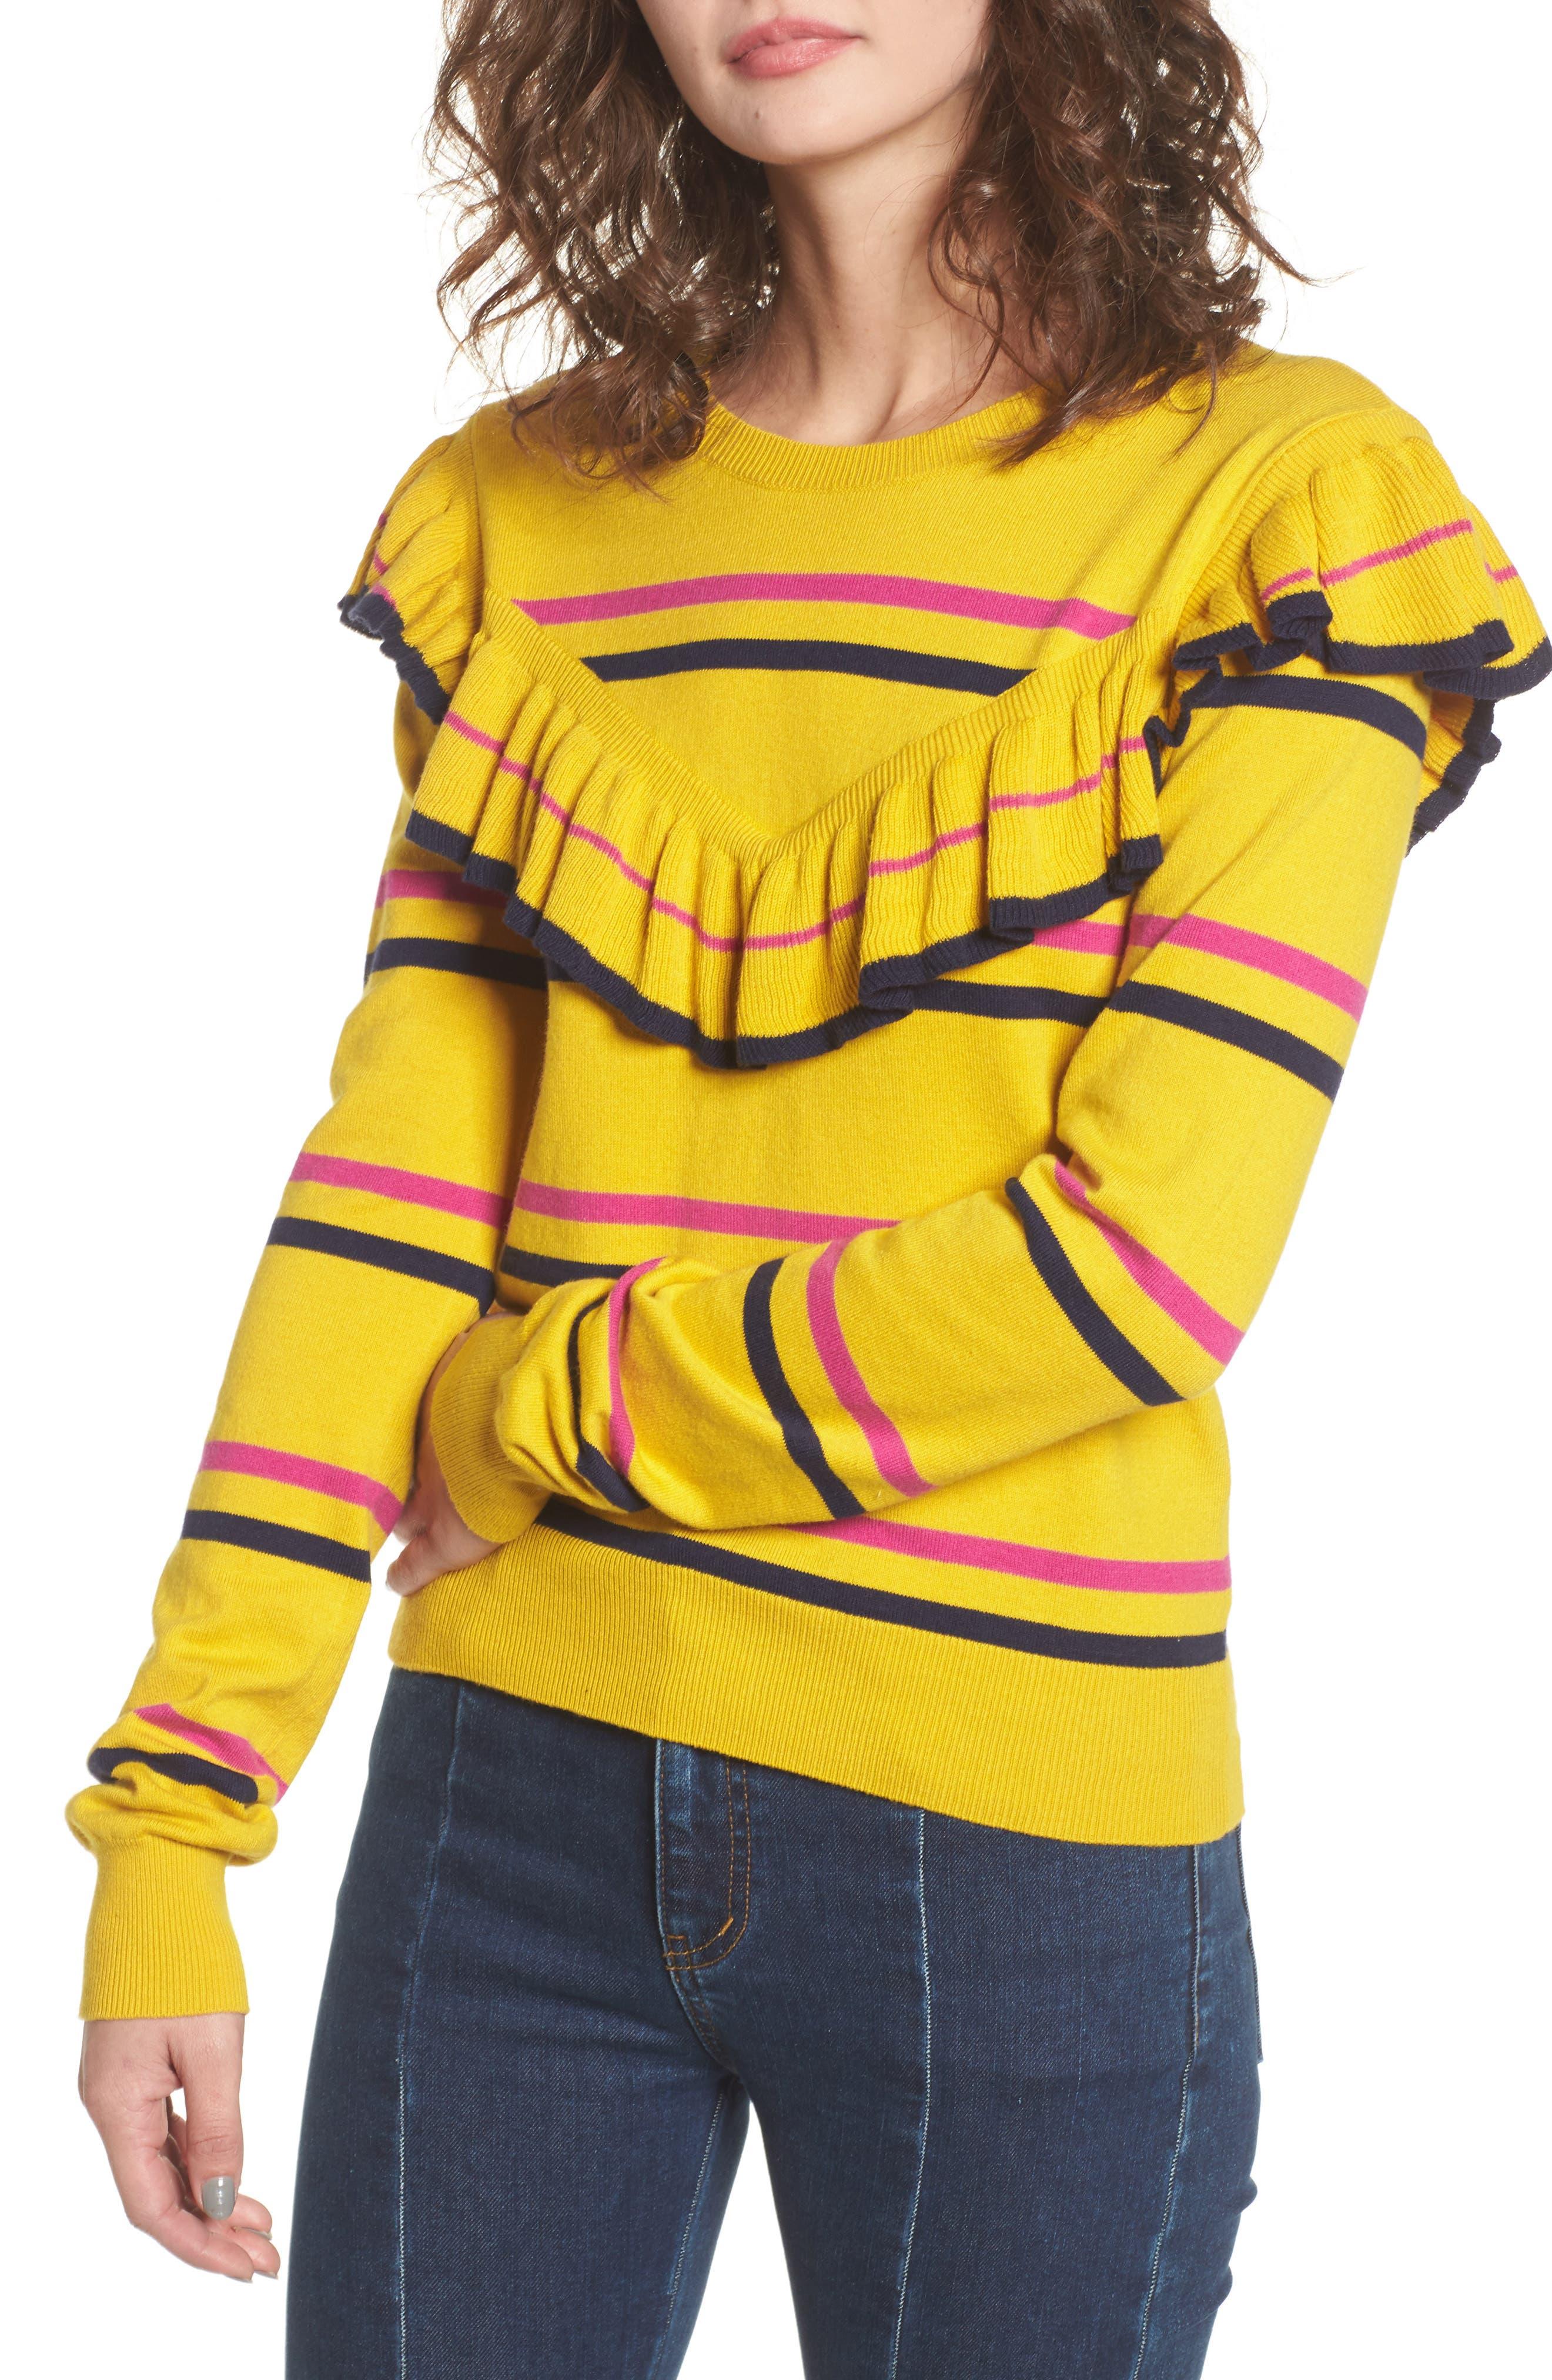 Ruffle Yoke Sweater,                             Main thumbnail 1, color,                             Yellow Sulfur Margret Stripe